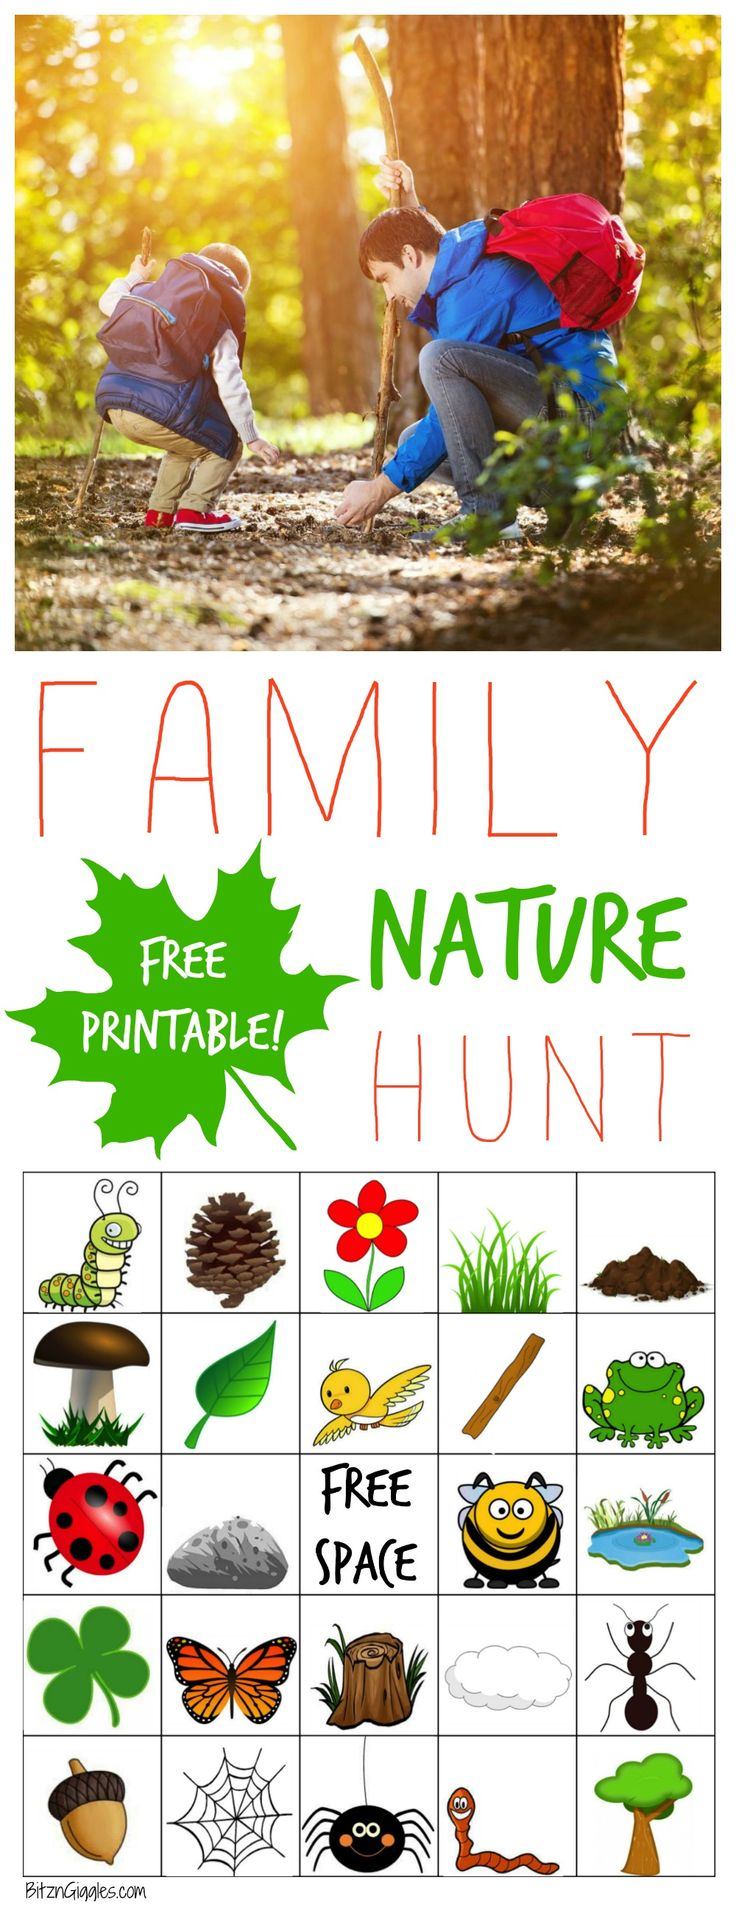 Family Nature Hunt - Melissa & Doug Blog